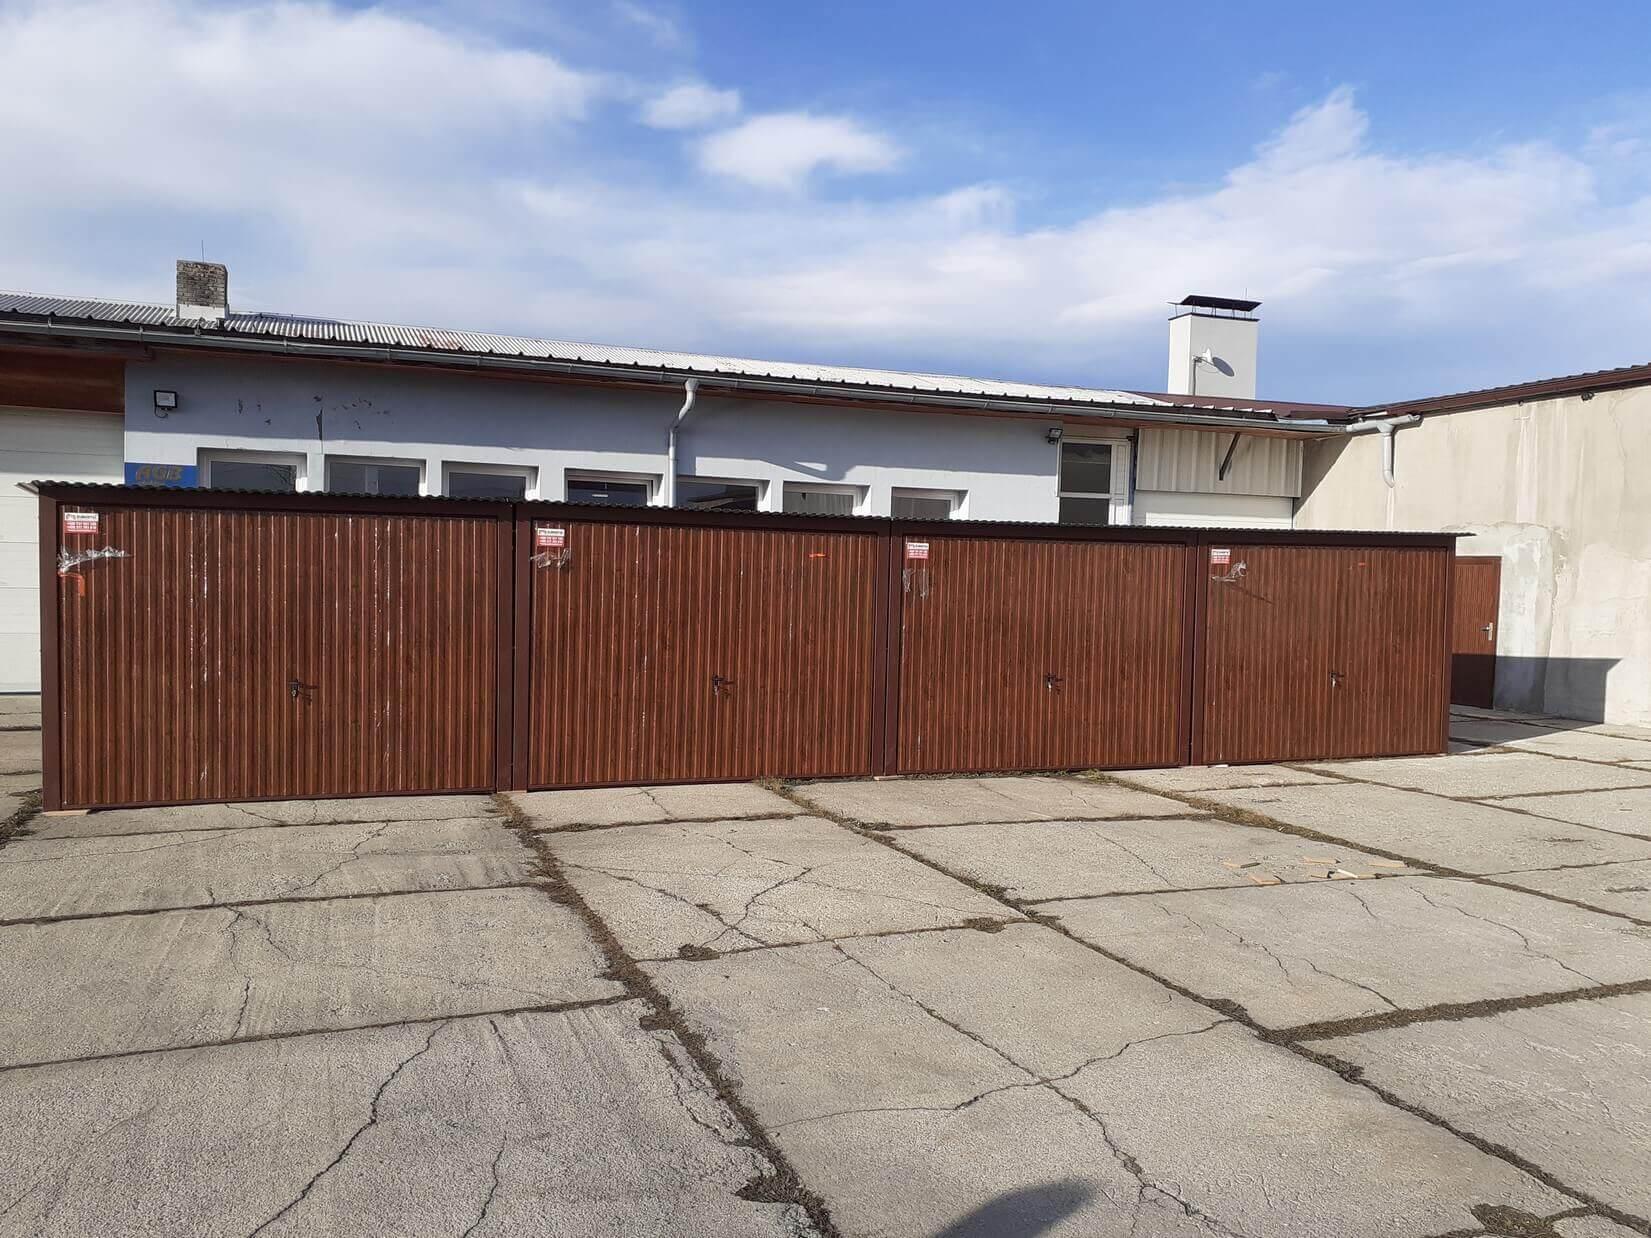 Plechová garáž 12×5 so spádom strechy dozadu tmavý orech